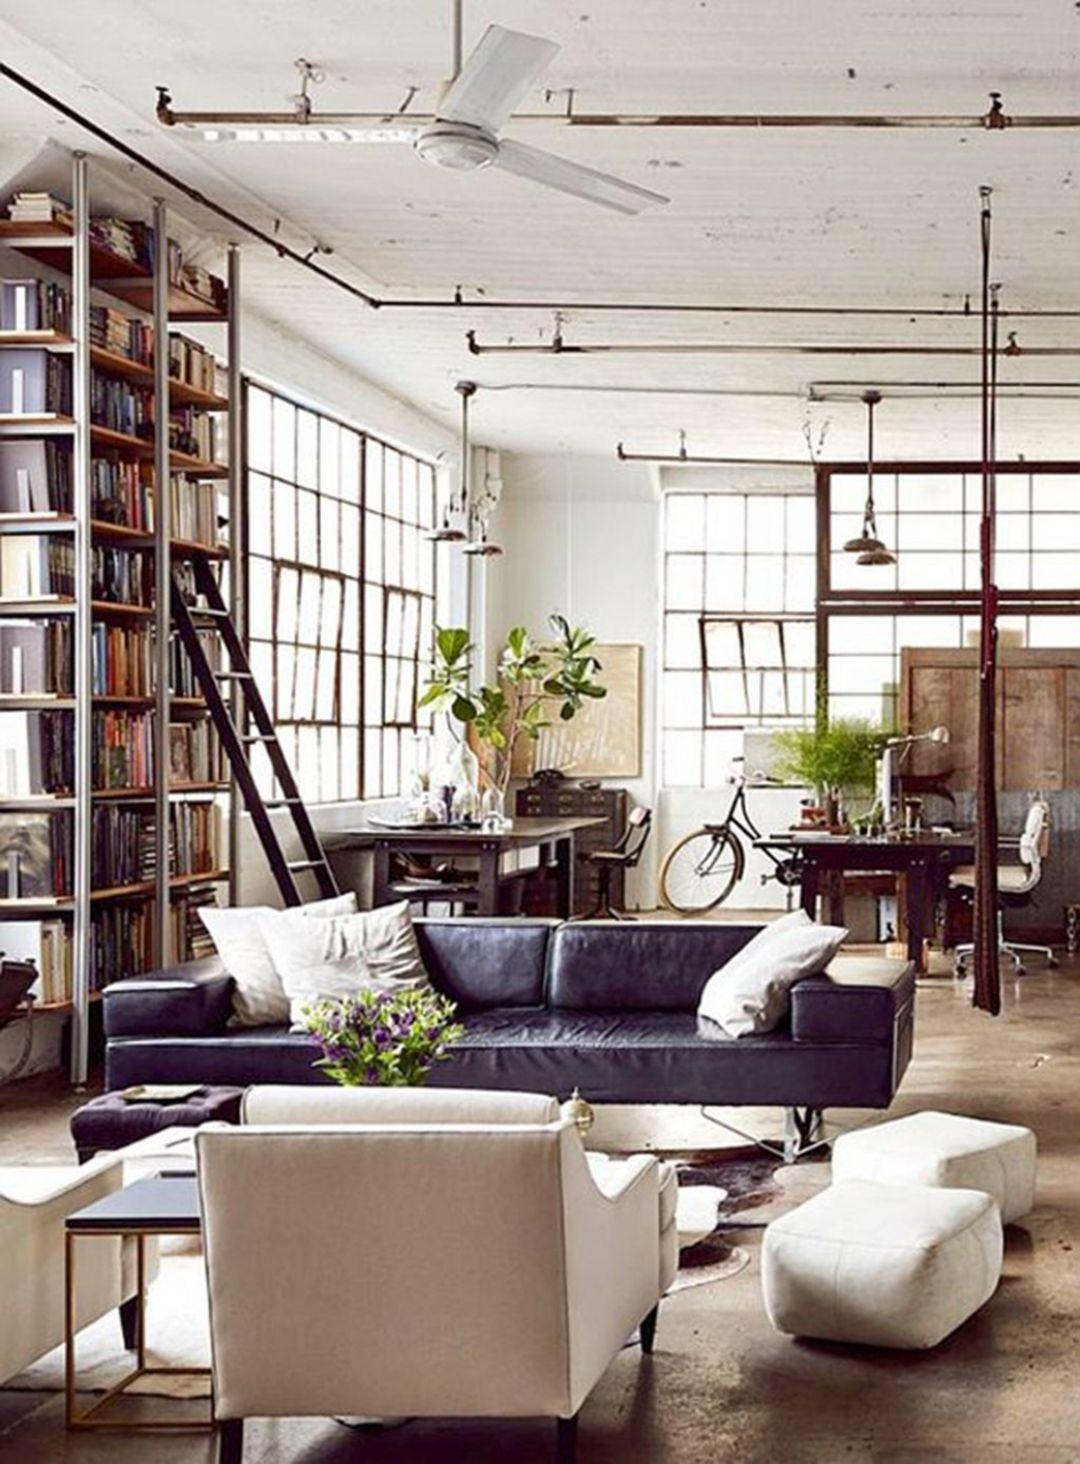 25 Stunning Industrial Small Living Room Design And Decor Ideas Dexorate Industrial Loft Design Loft Living Loft Interiors